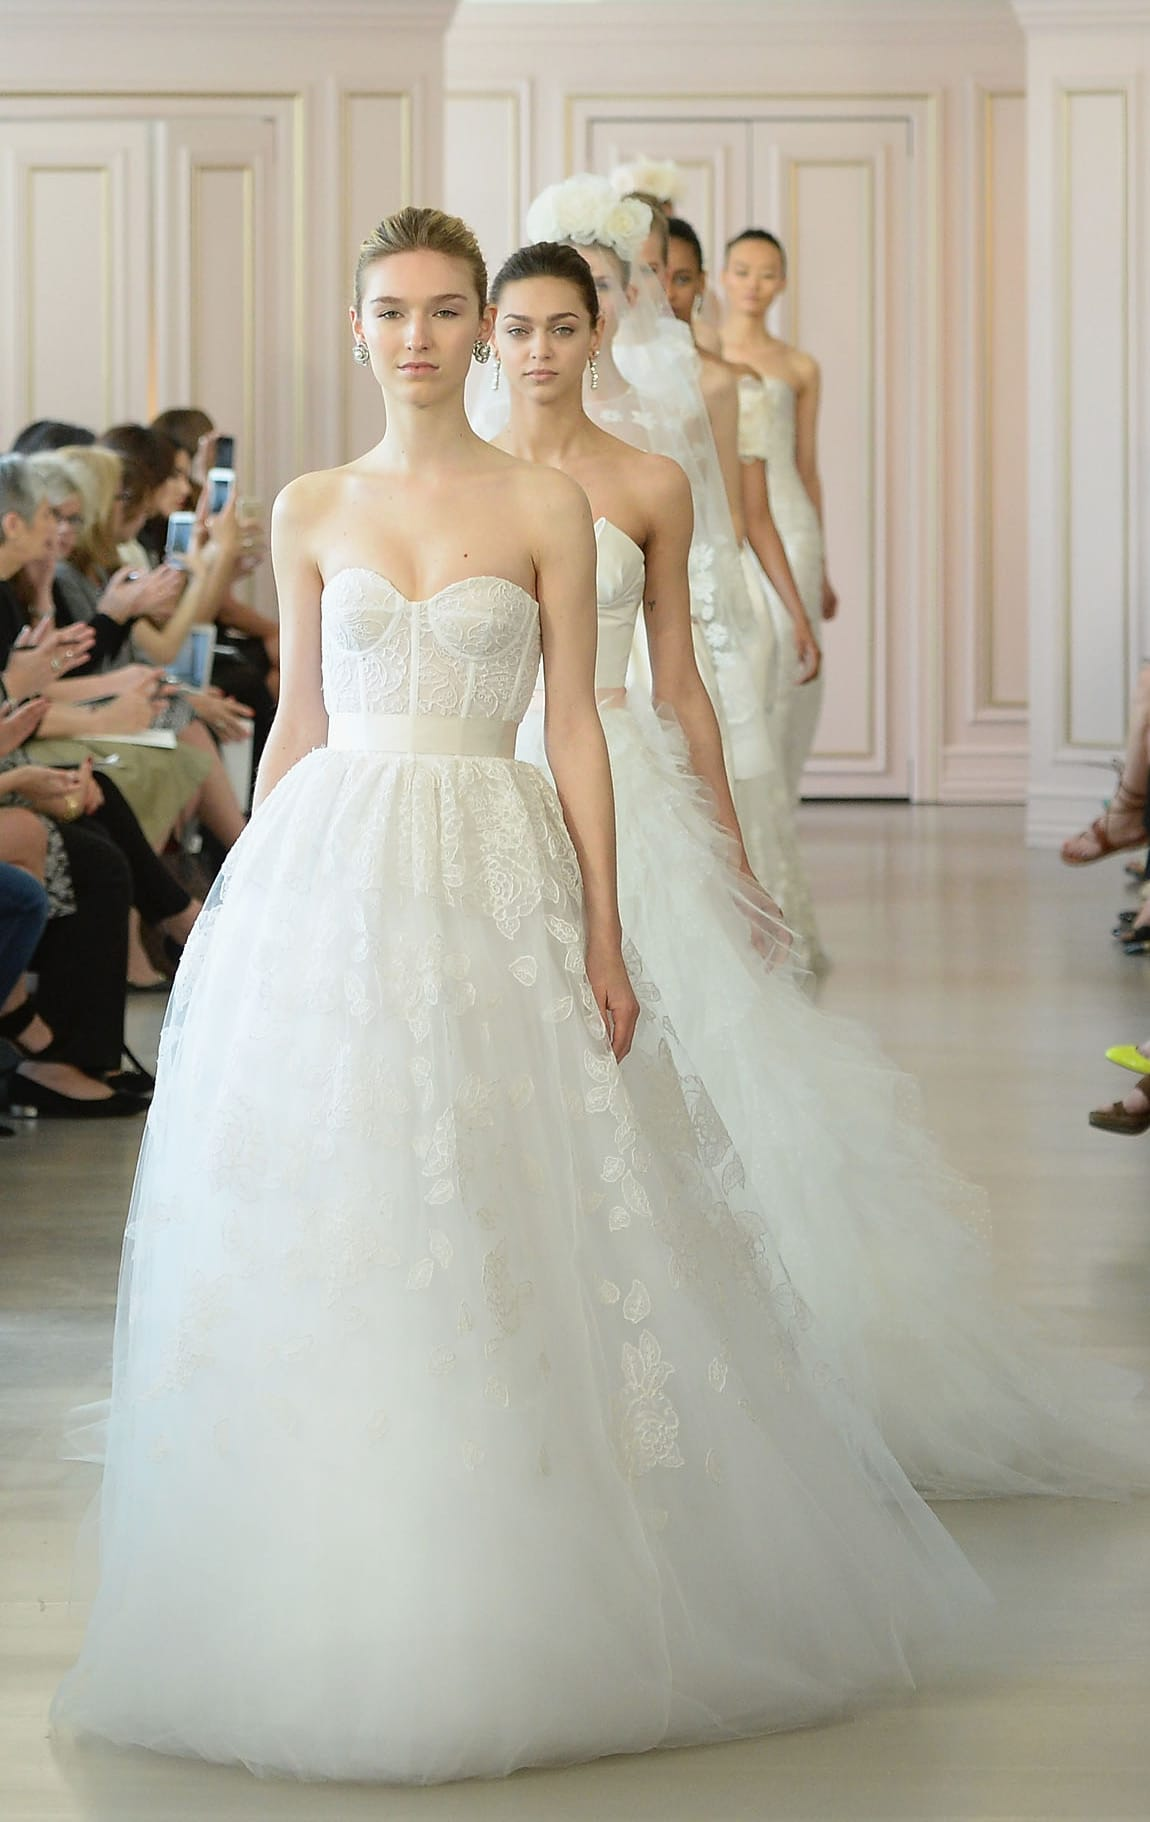 Where to Buy Wedding Dresses in Dubai - Savoir Flair